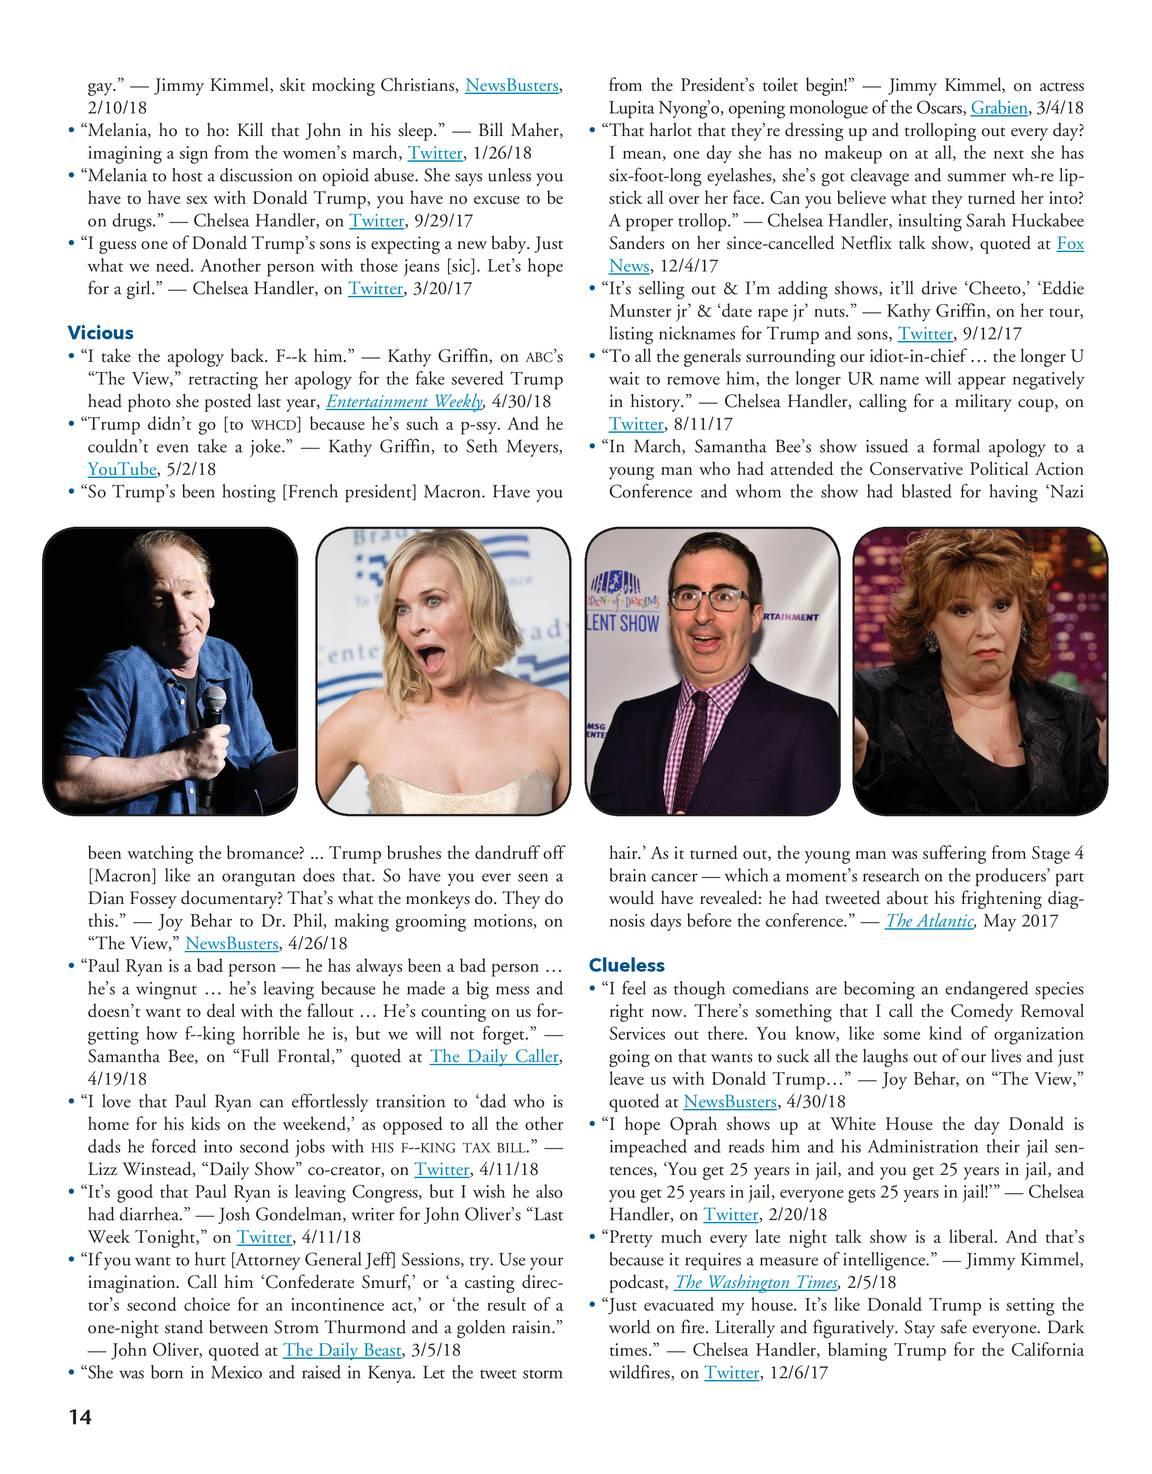 4 Teras De Porno the limbaugh letter - june 2018 - page 13